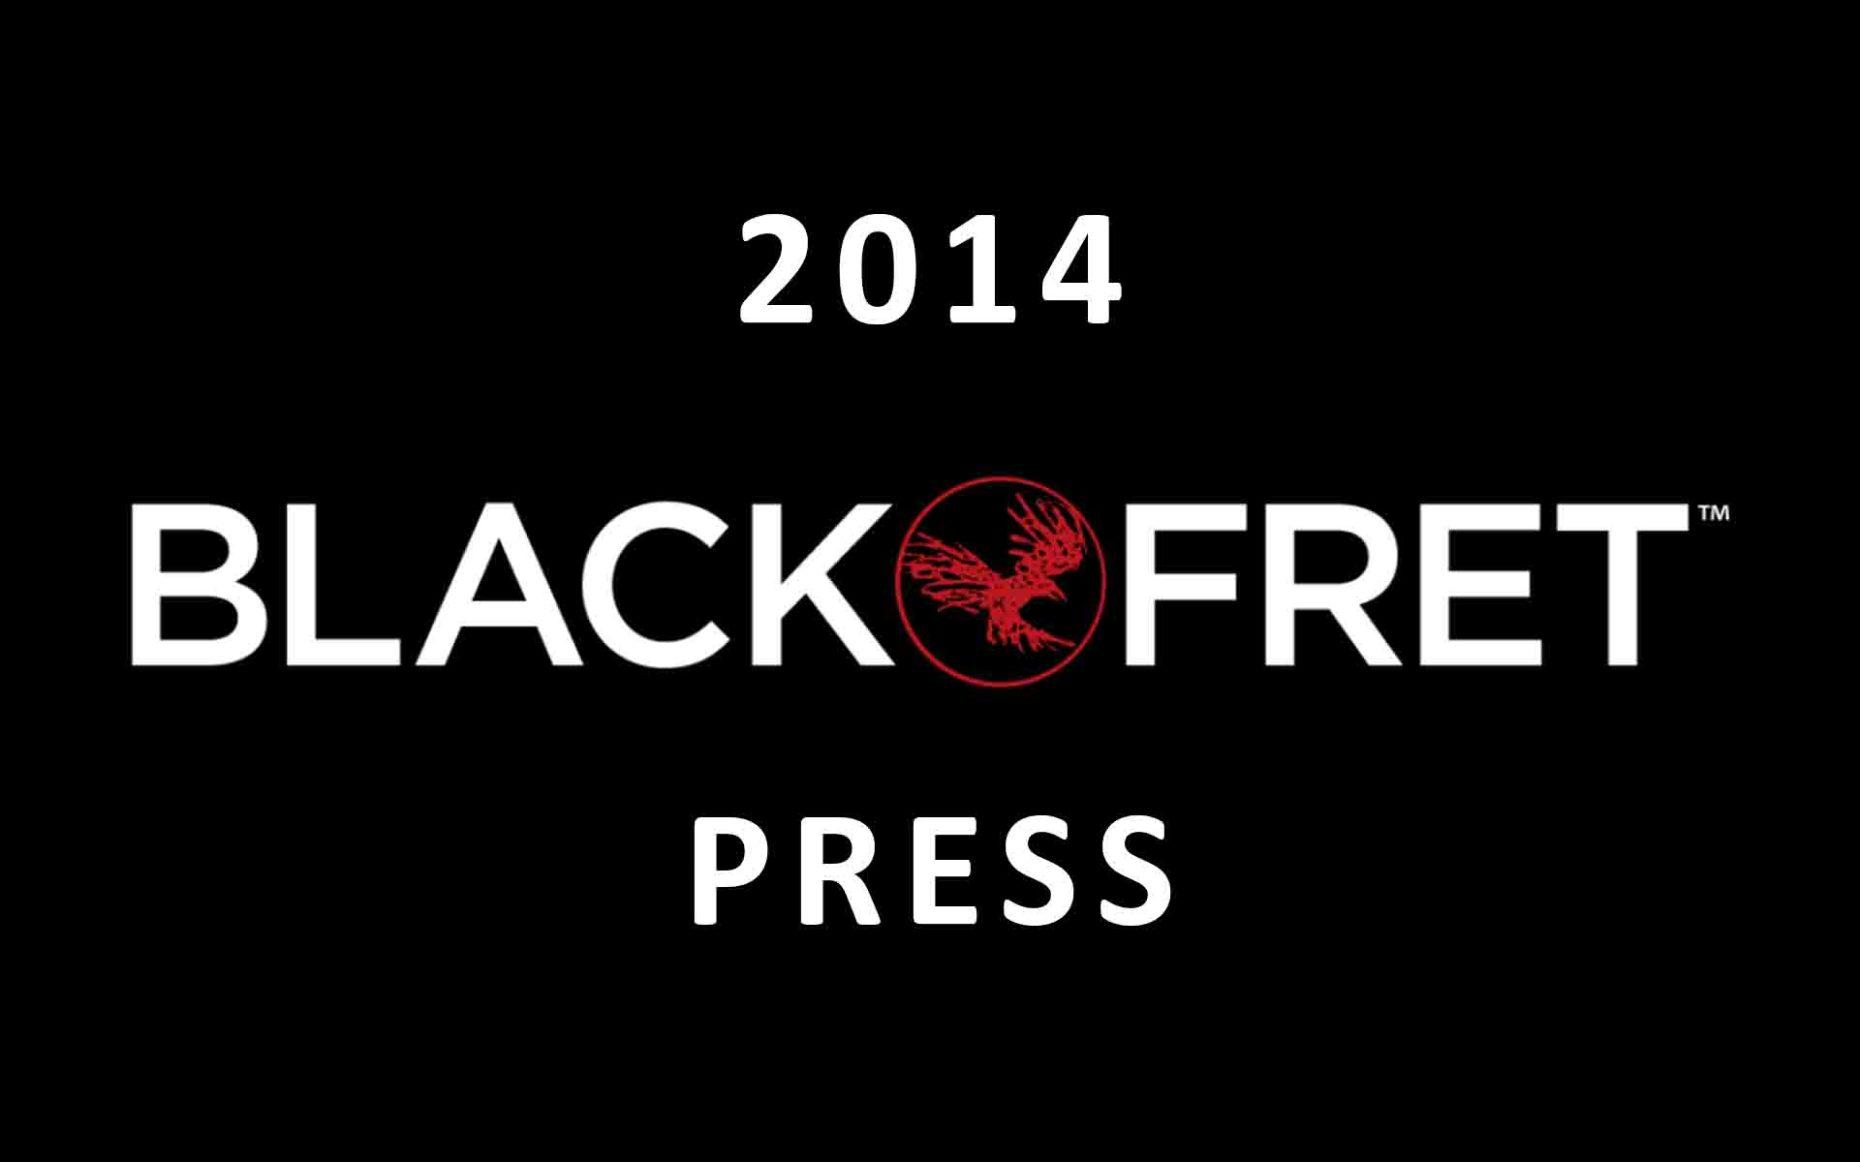 2014 PRESS